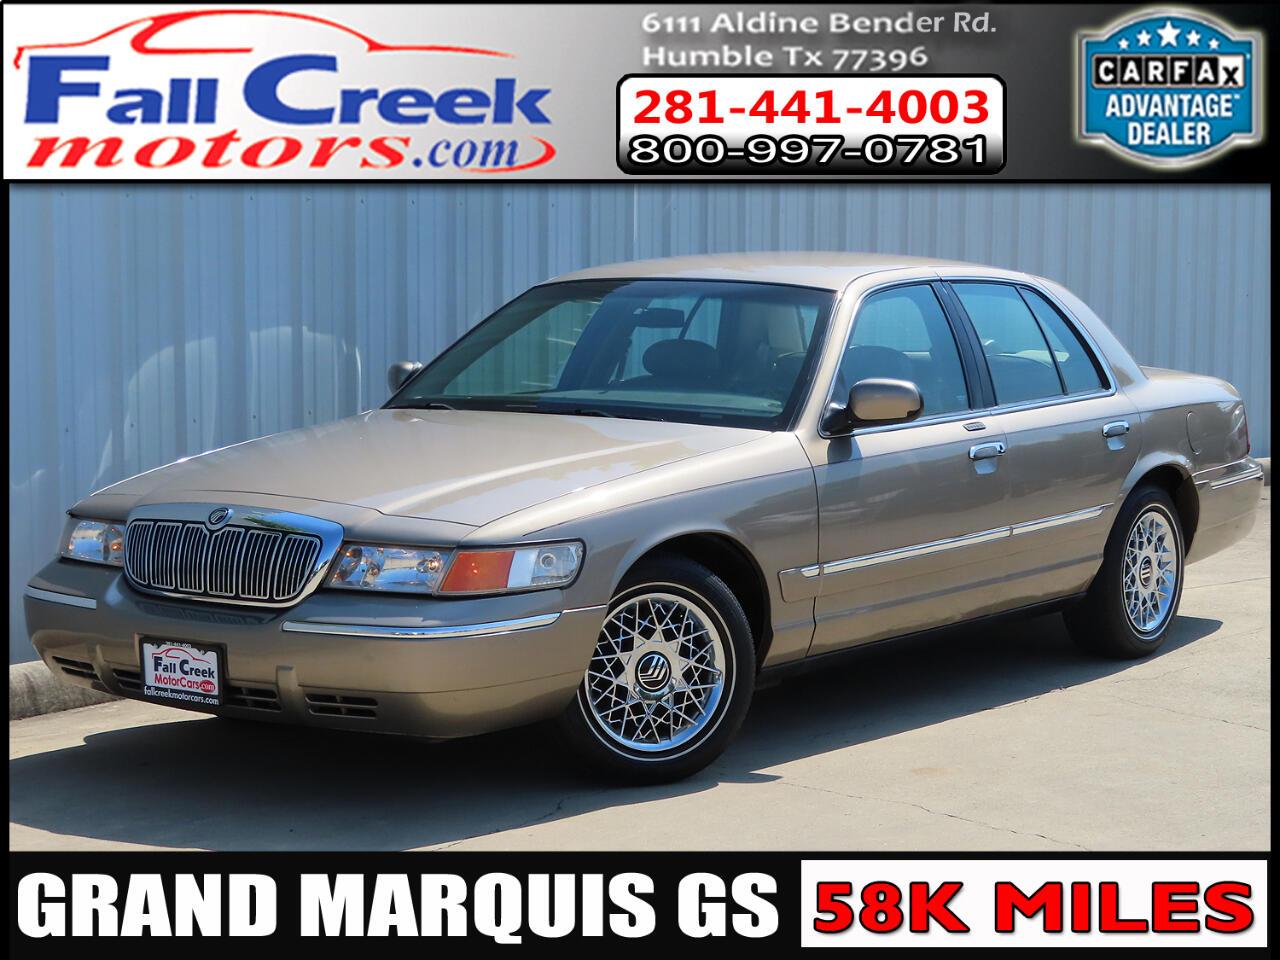 2001 Mercury Grand Marquis GS